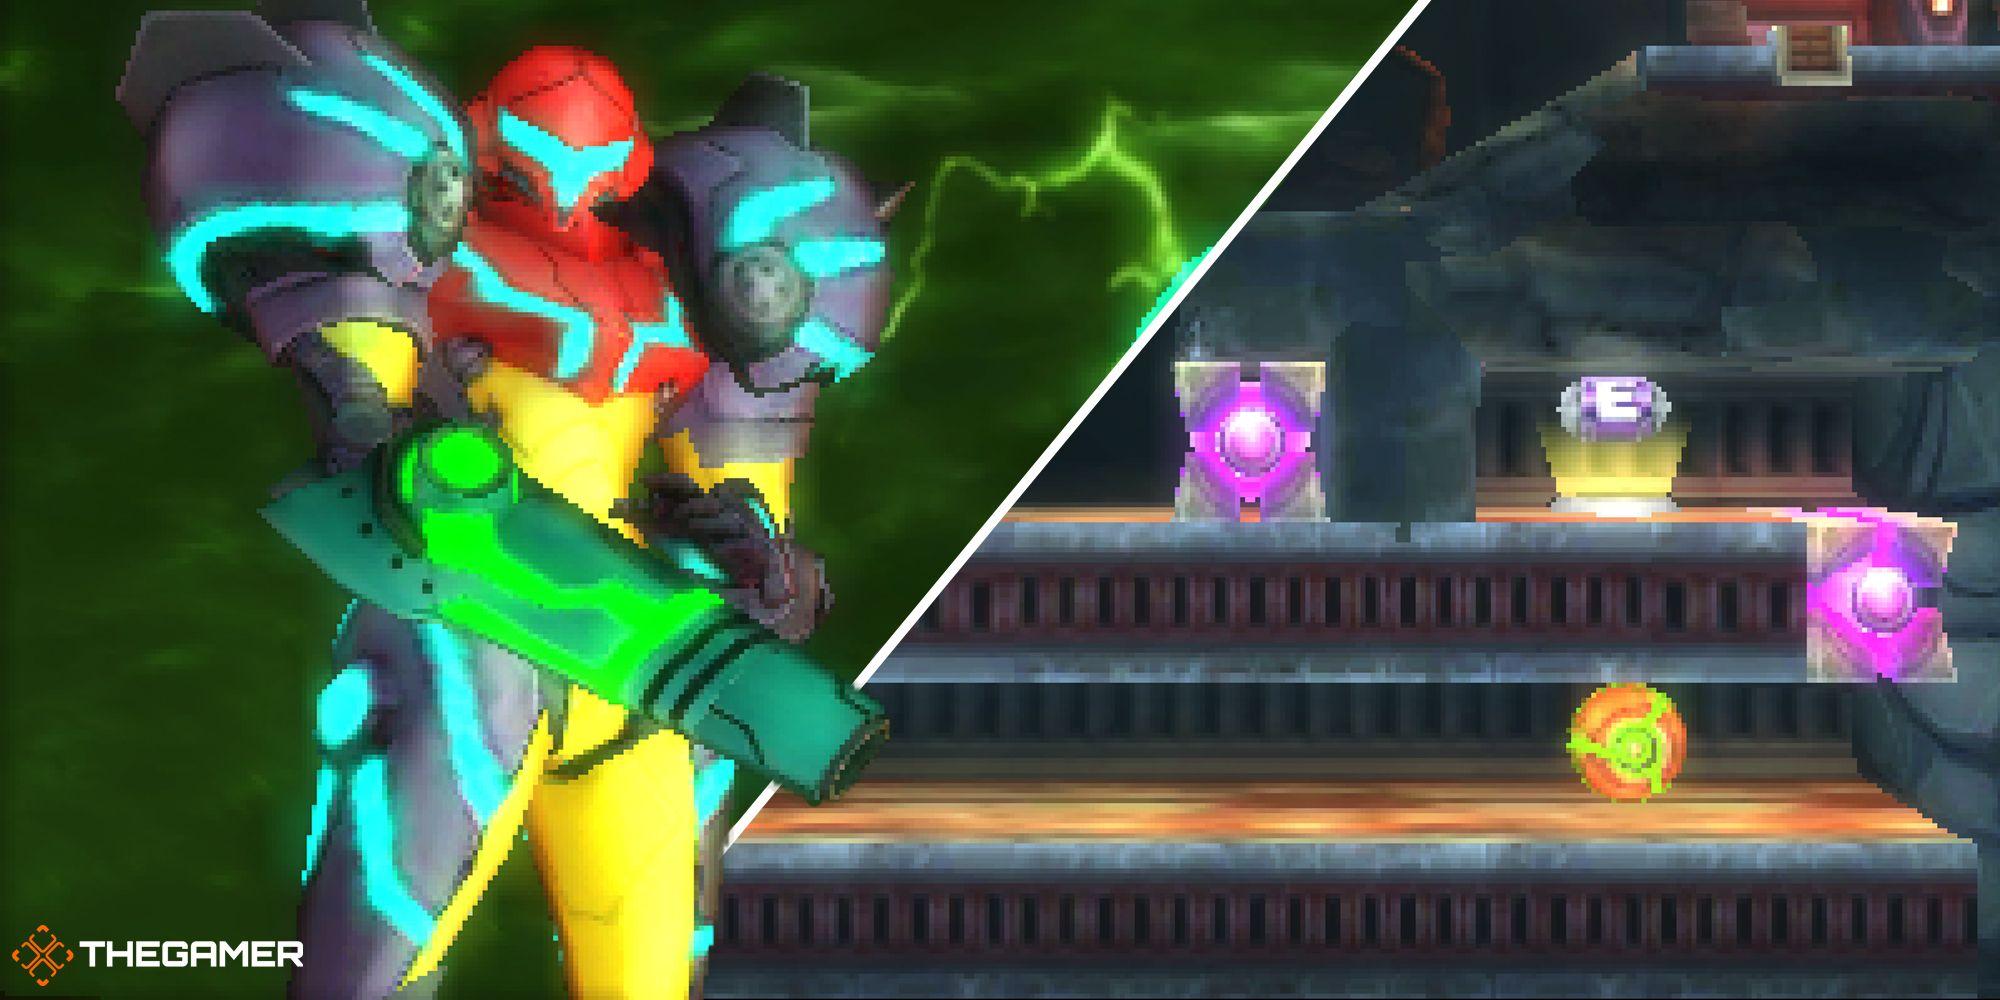 Metroid Samus Returns: Ubicaciones de tanques de energía